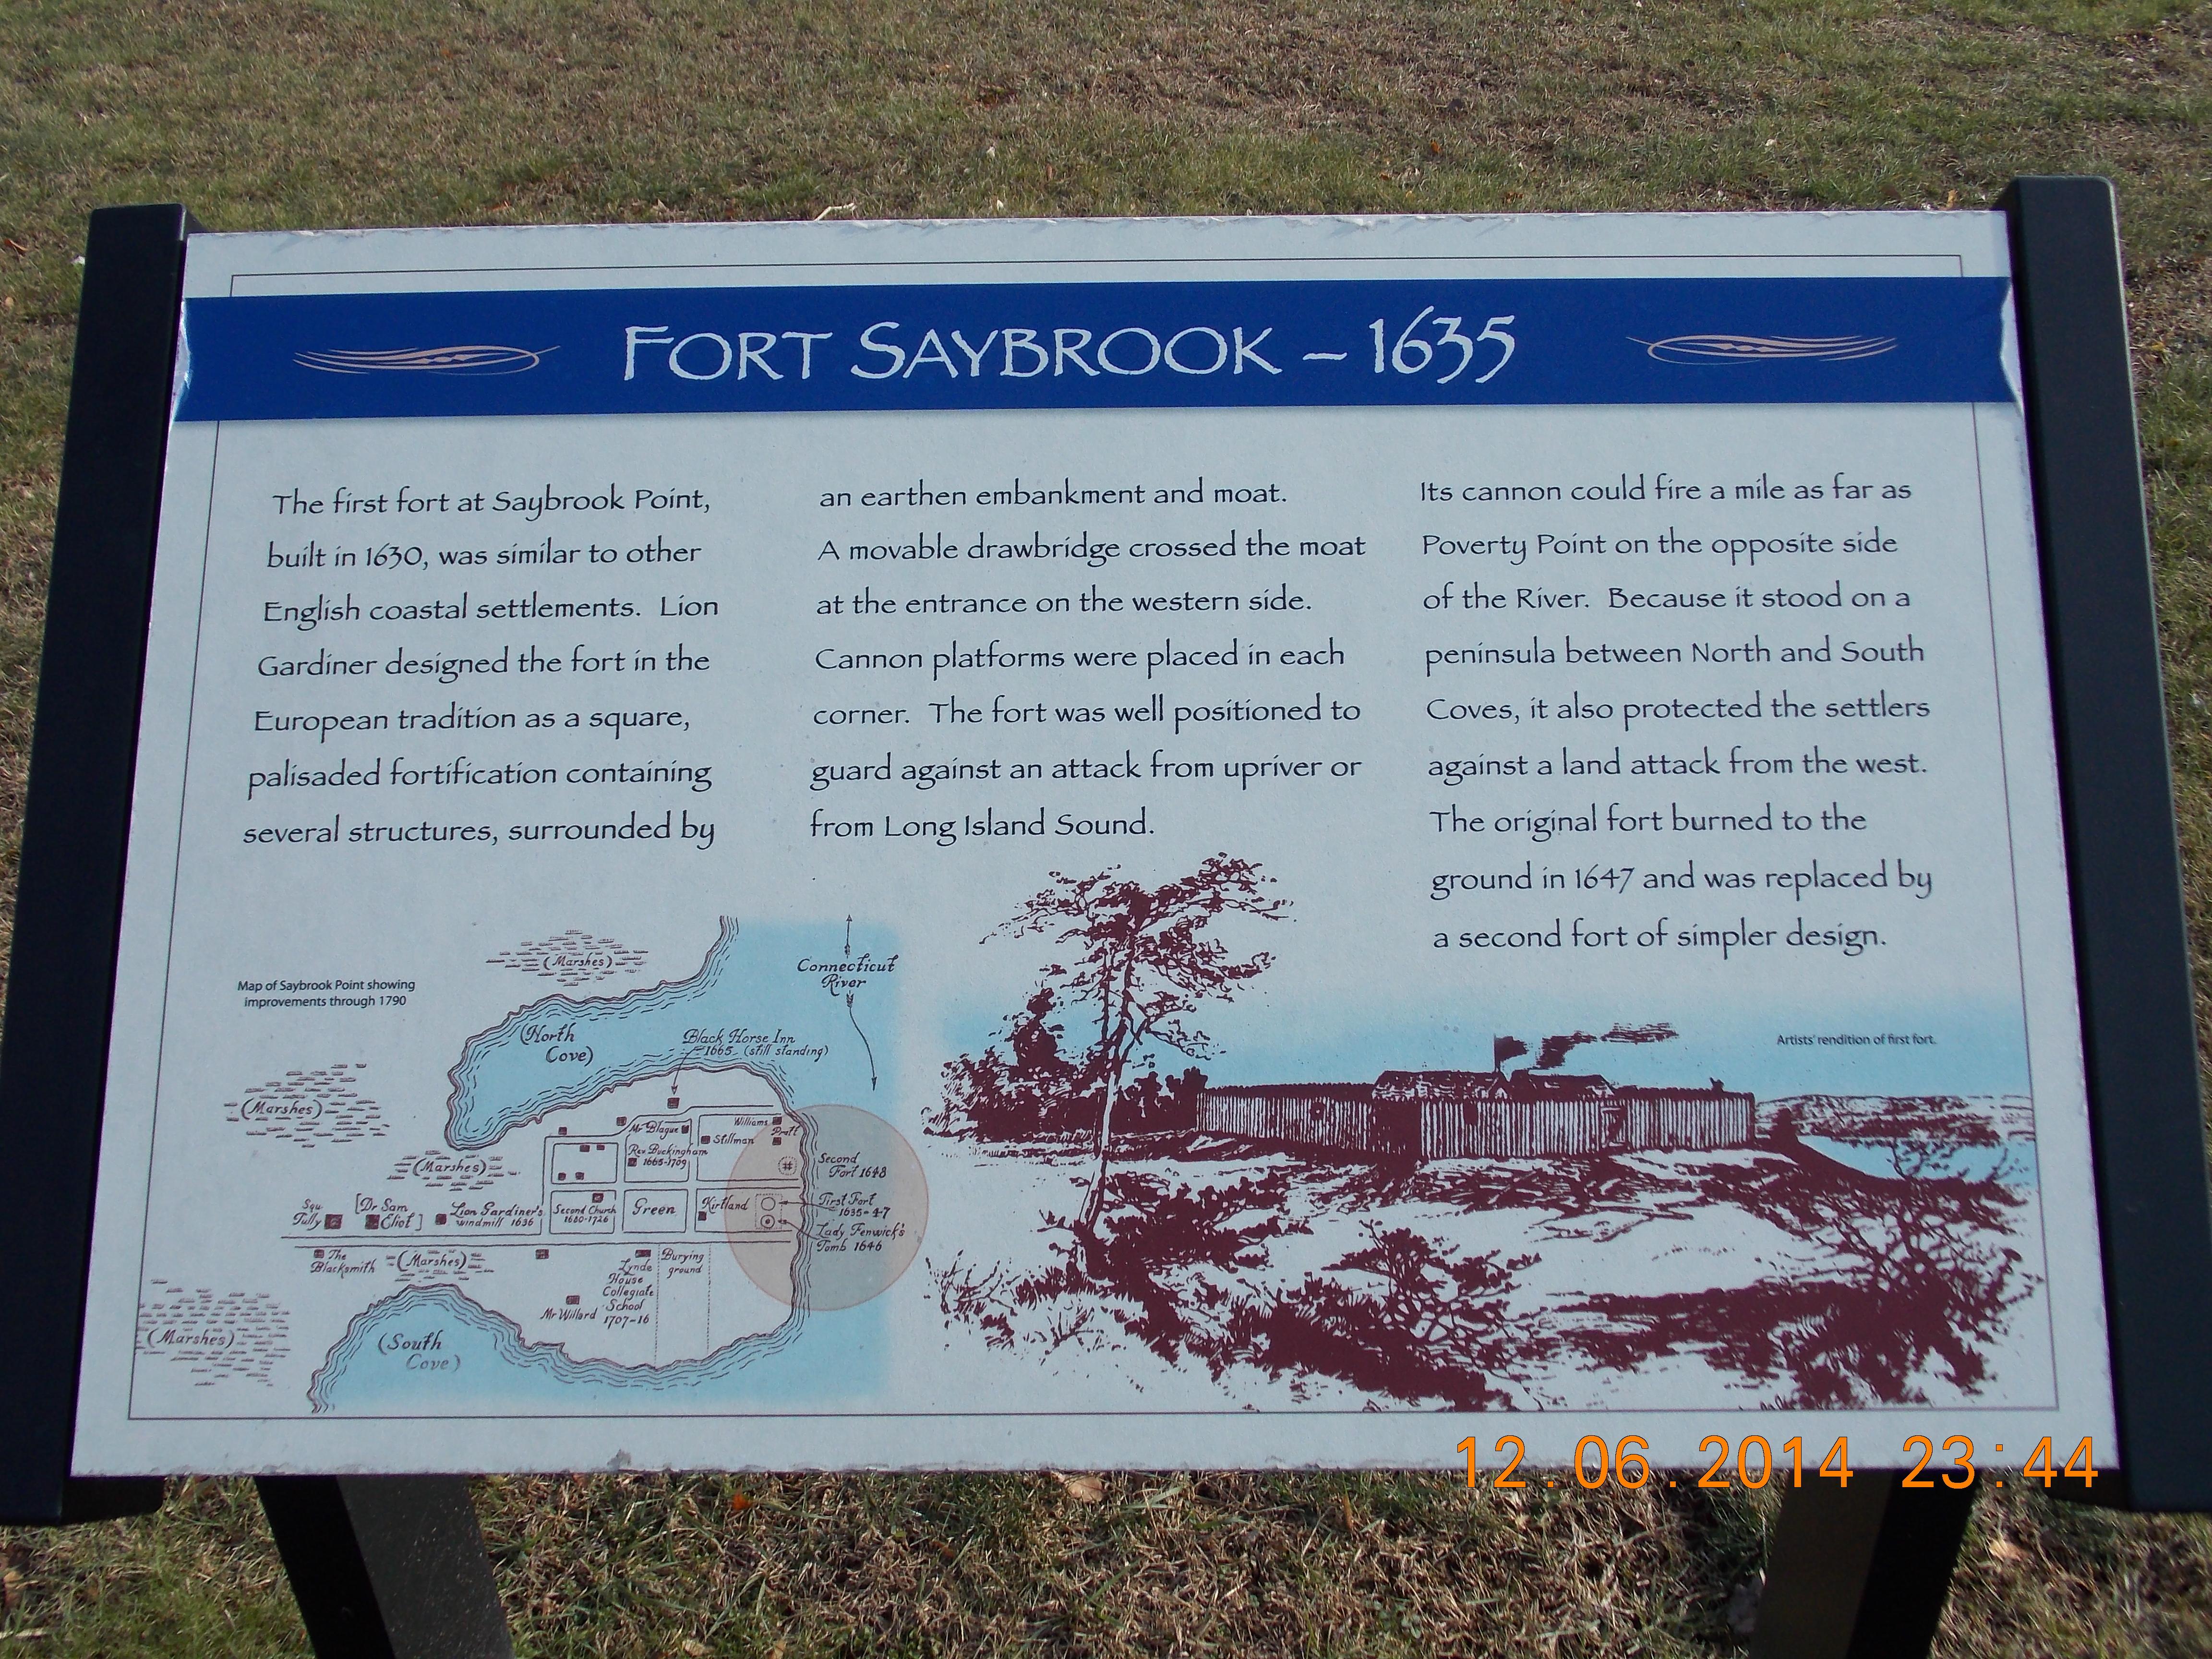 Fort Saybrook